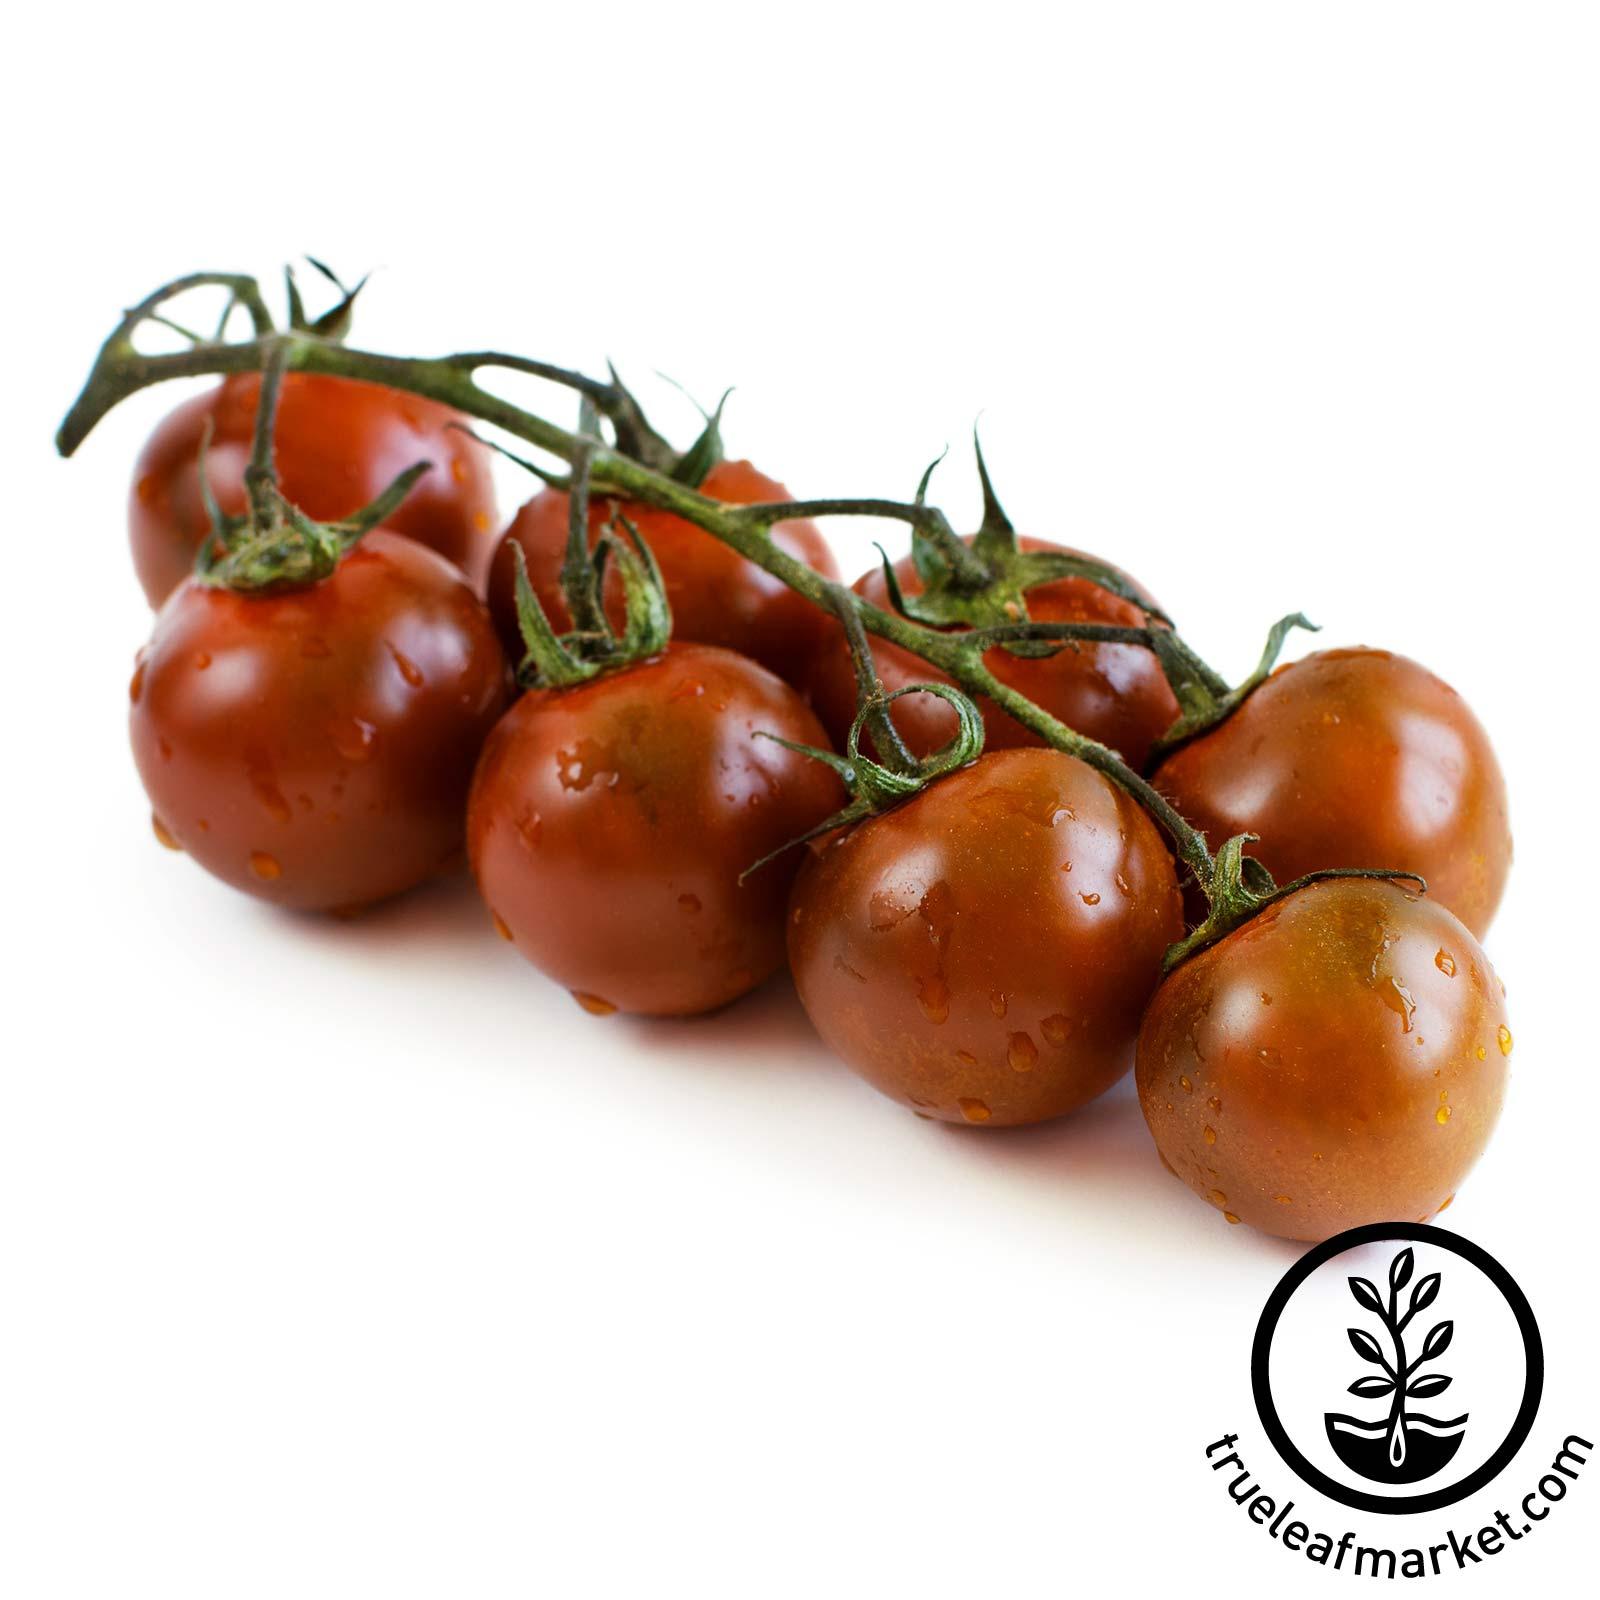 Tomato Garden Seeds – Chocolate Cherry – 250 mg Packet – Non-GMO ...